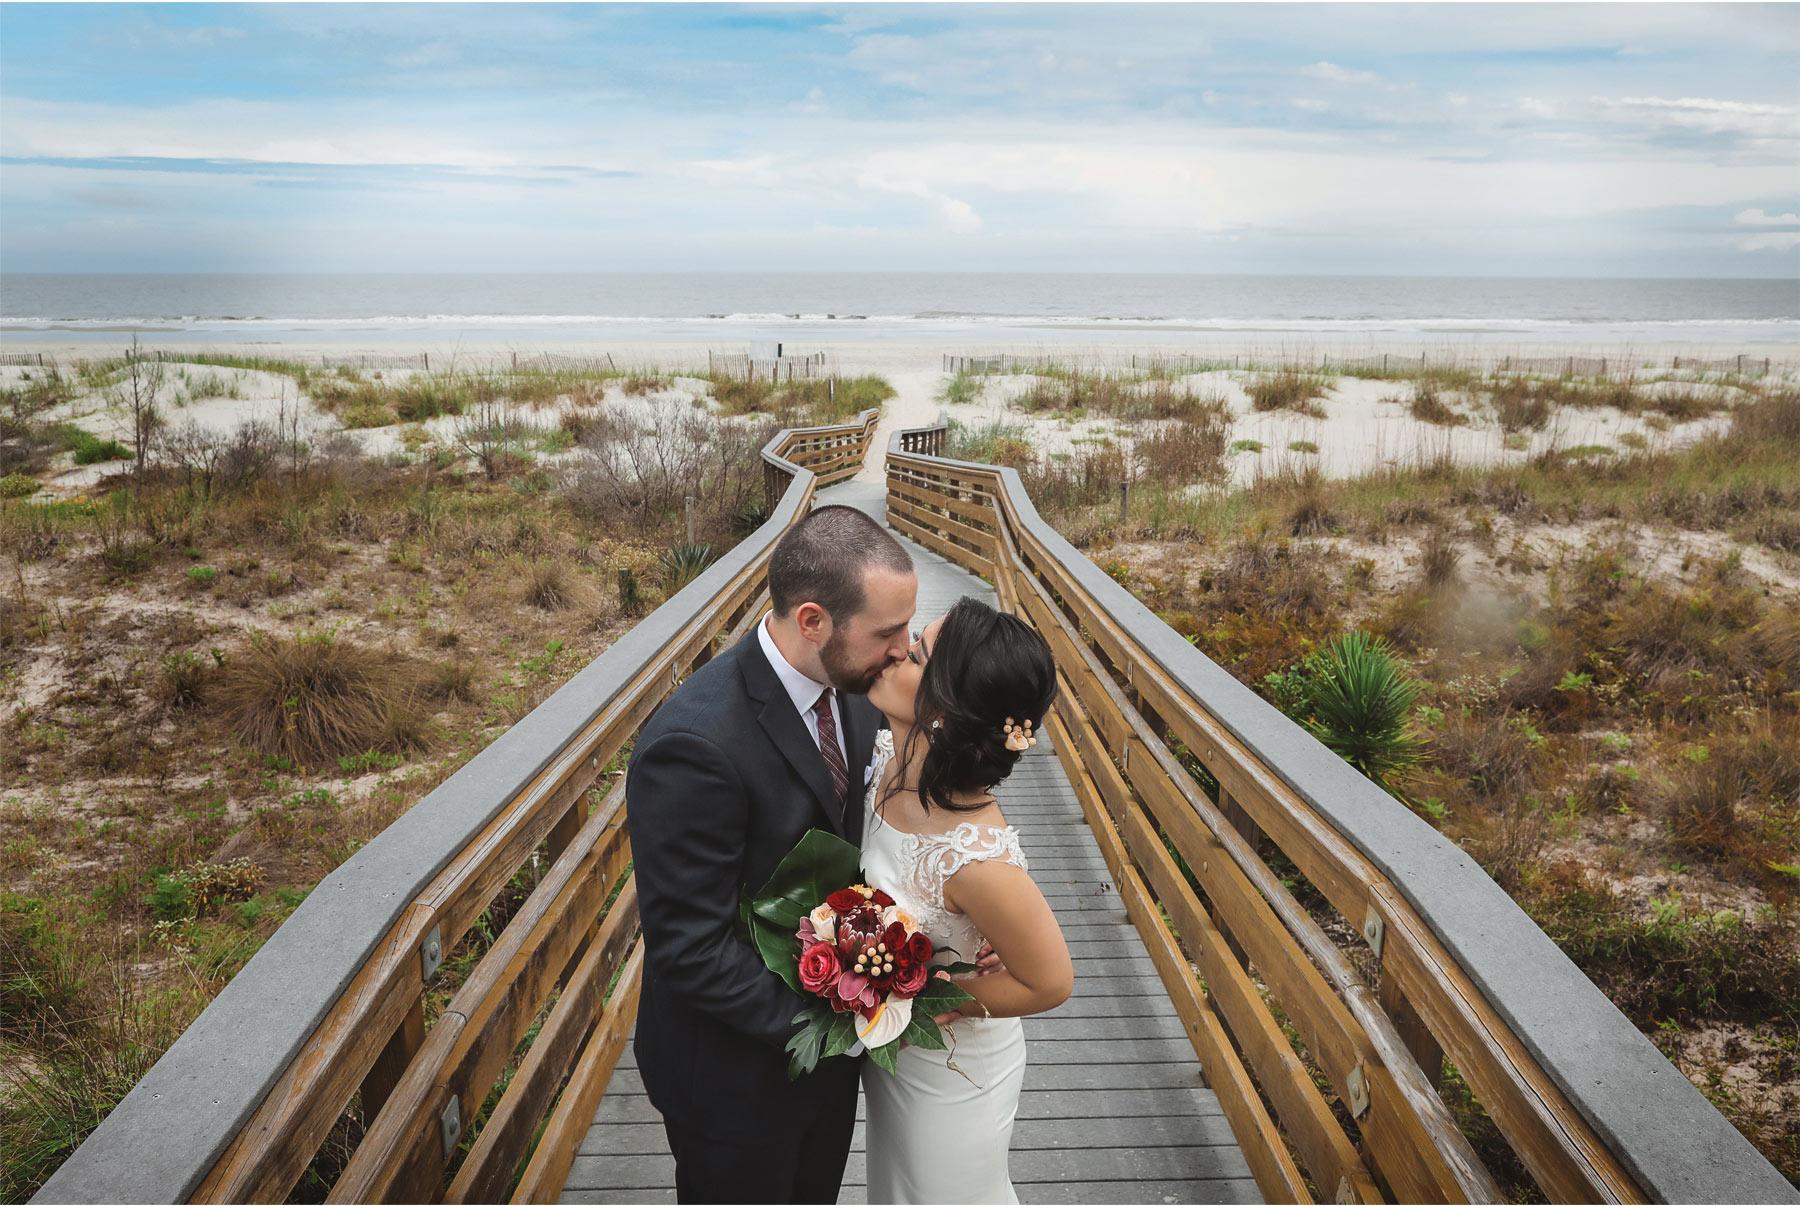 08-South-Carolina-Wedding-by-Vick-Photography-Hilton-Head-Island-Omni-Oceanfront-Hotel-Destination-First-Look-Beach-Ocean-Boardwalk-Tropical-Felyn-and-Will.jpg